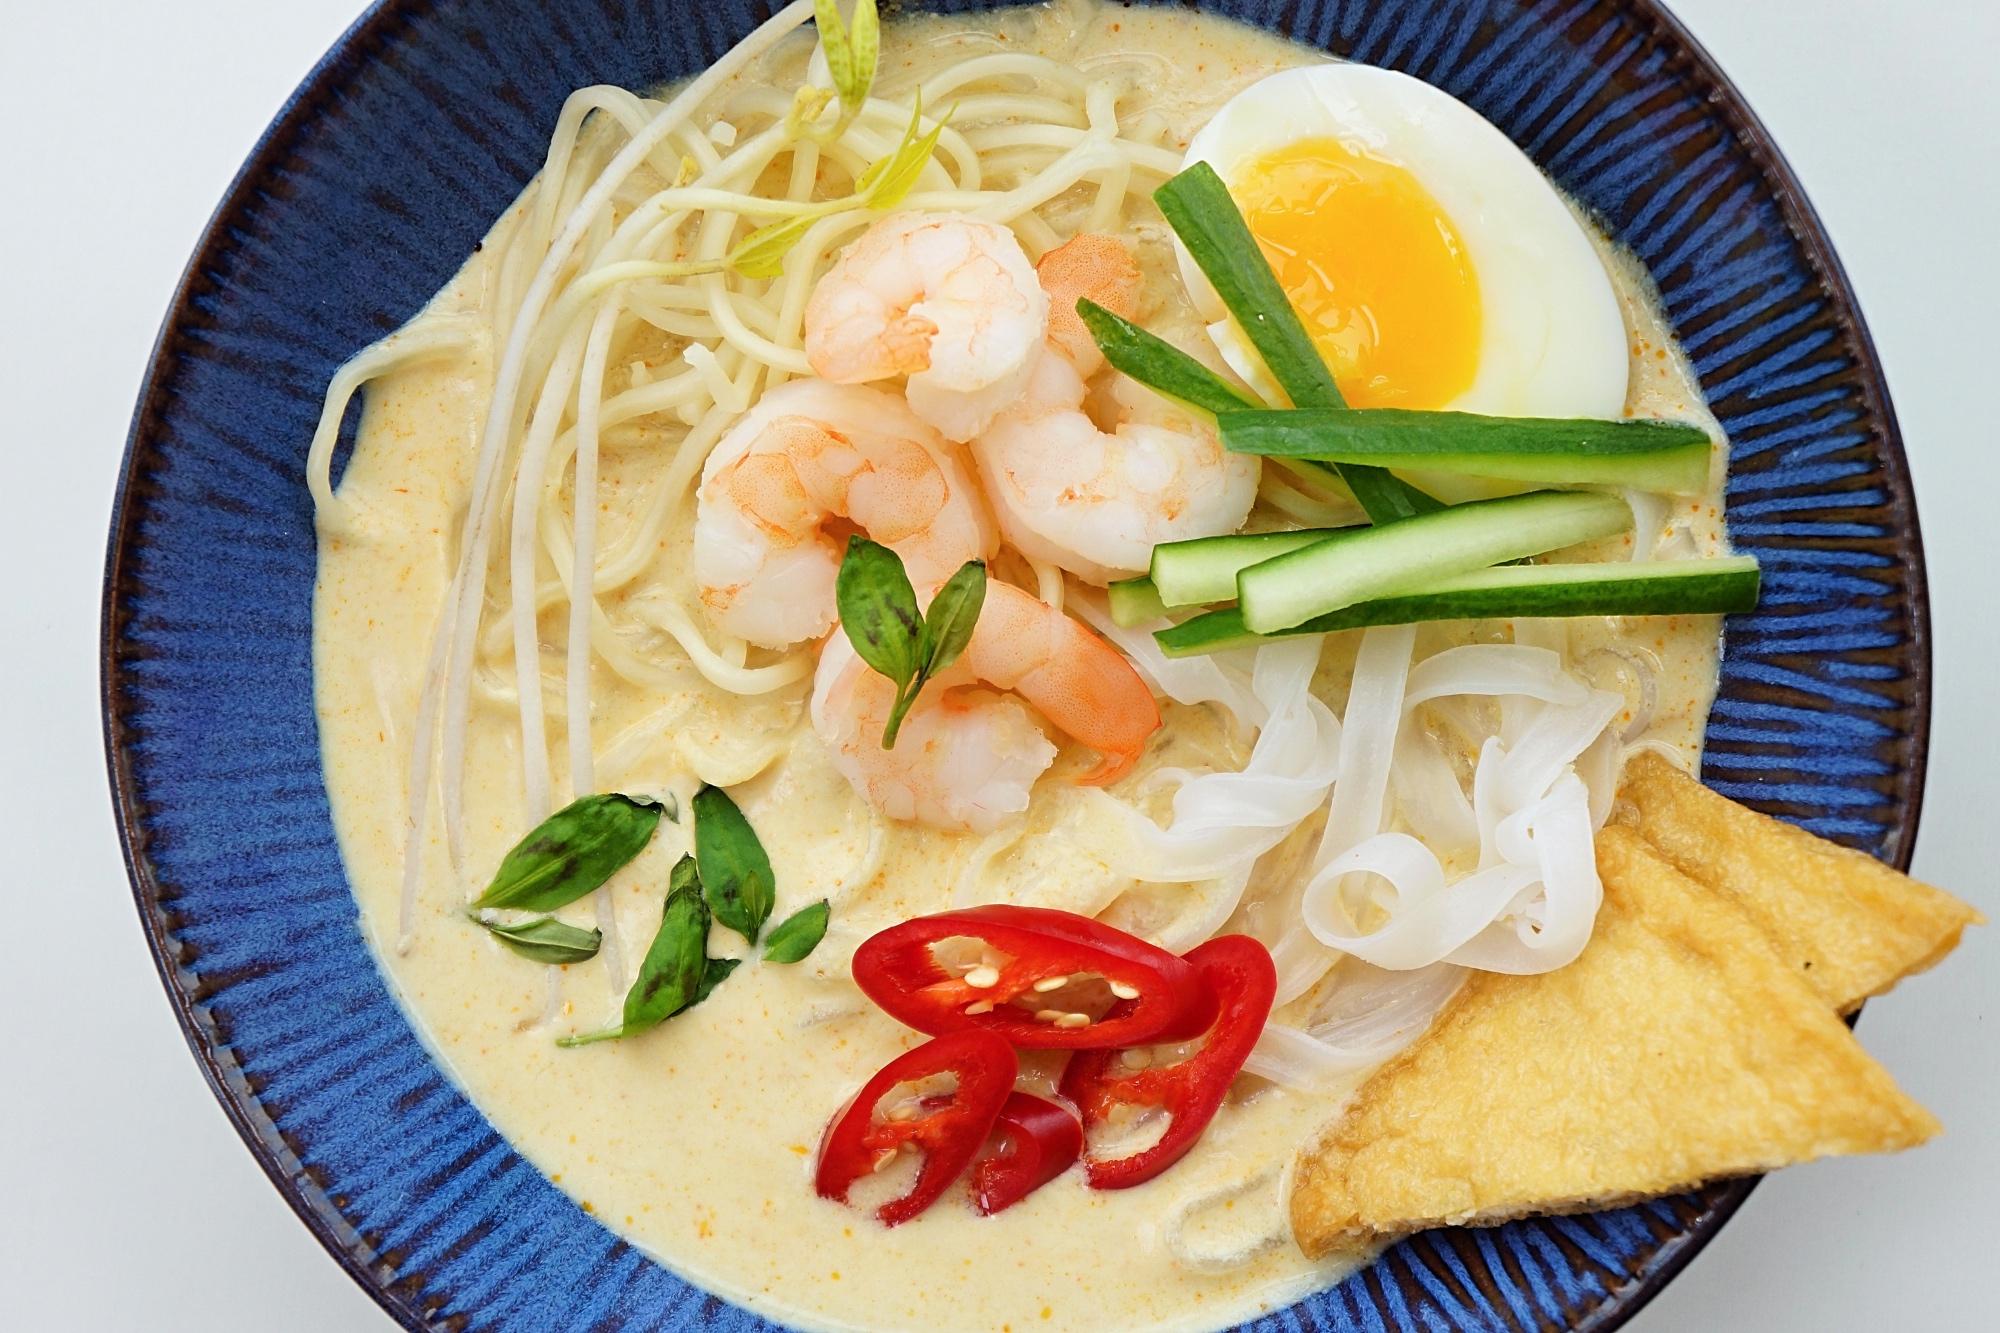 Malezyjska zupa laksa jak zrobic